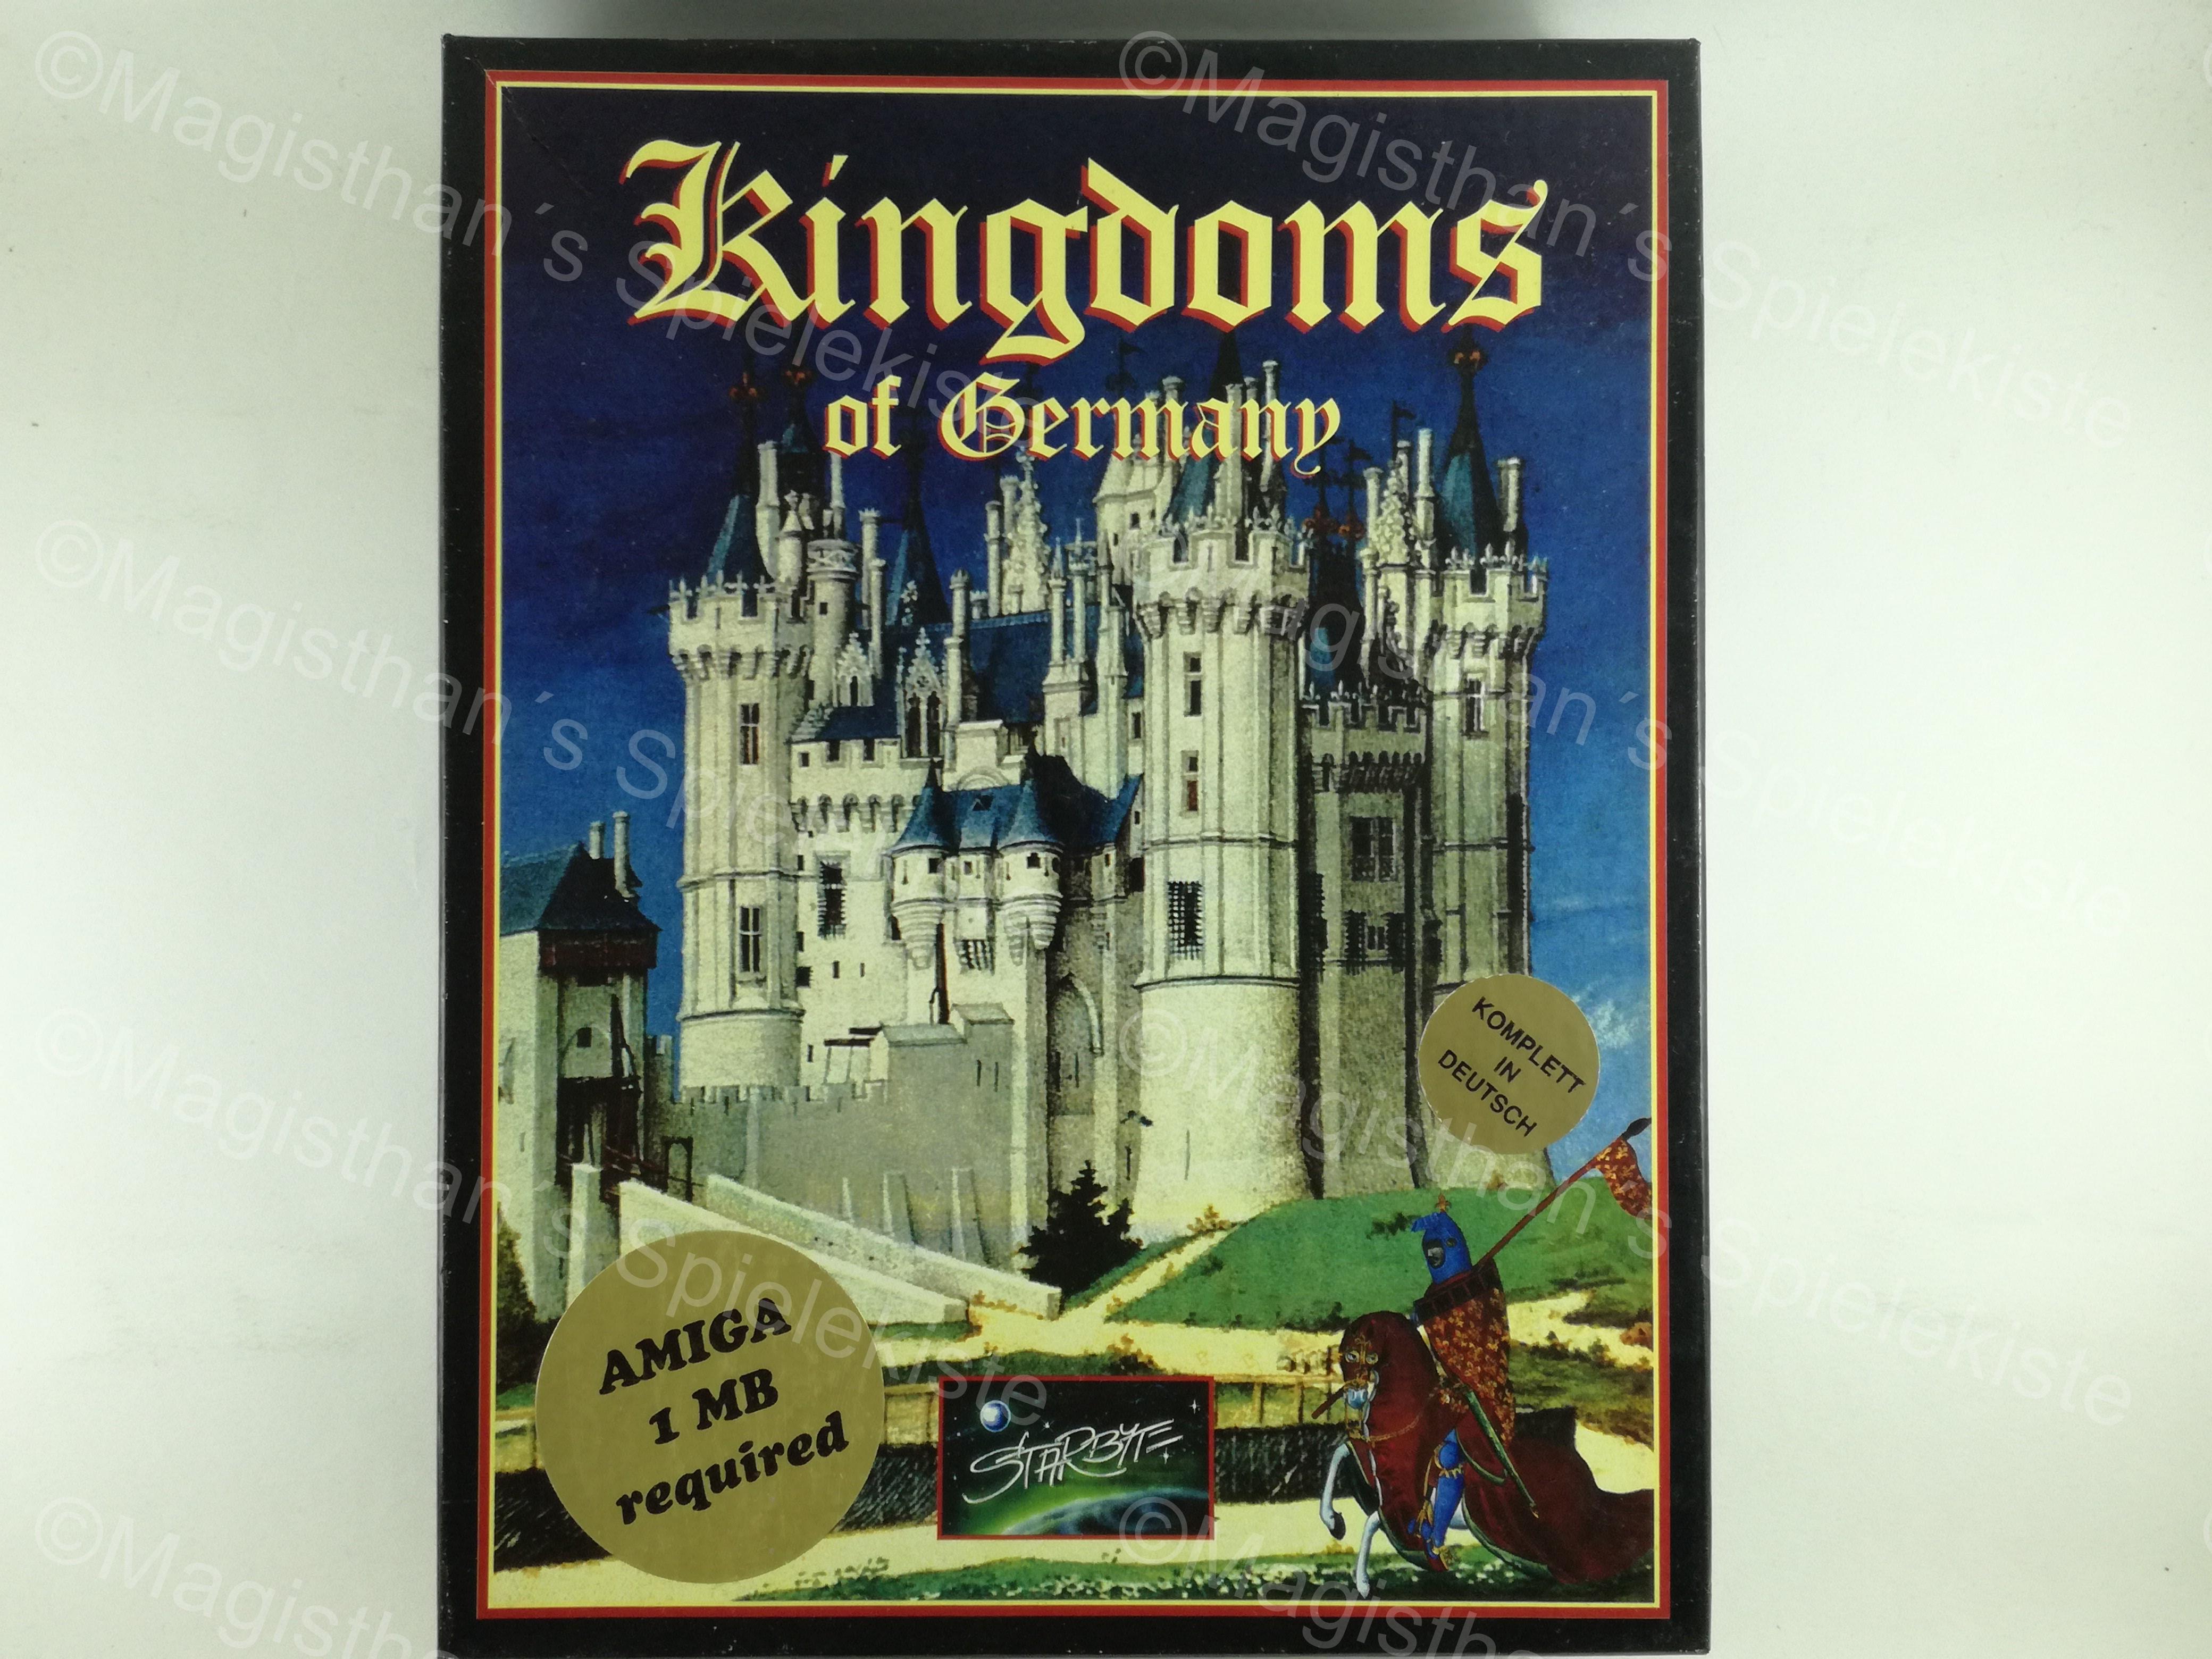 KingdomsofGermanyAmiga1.jpg